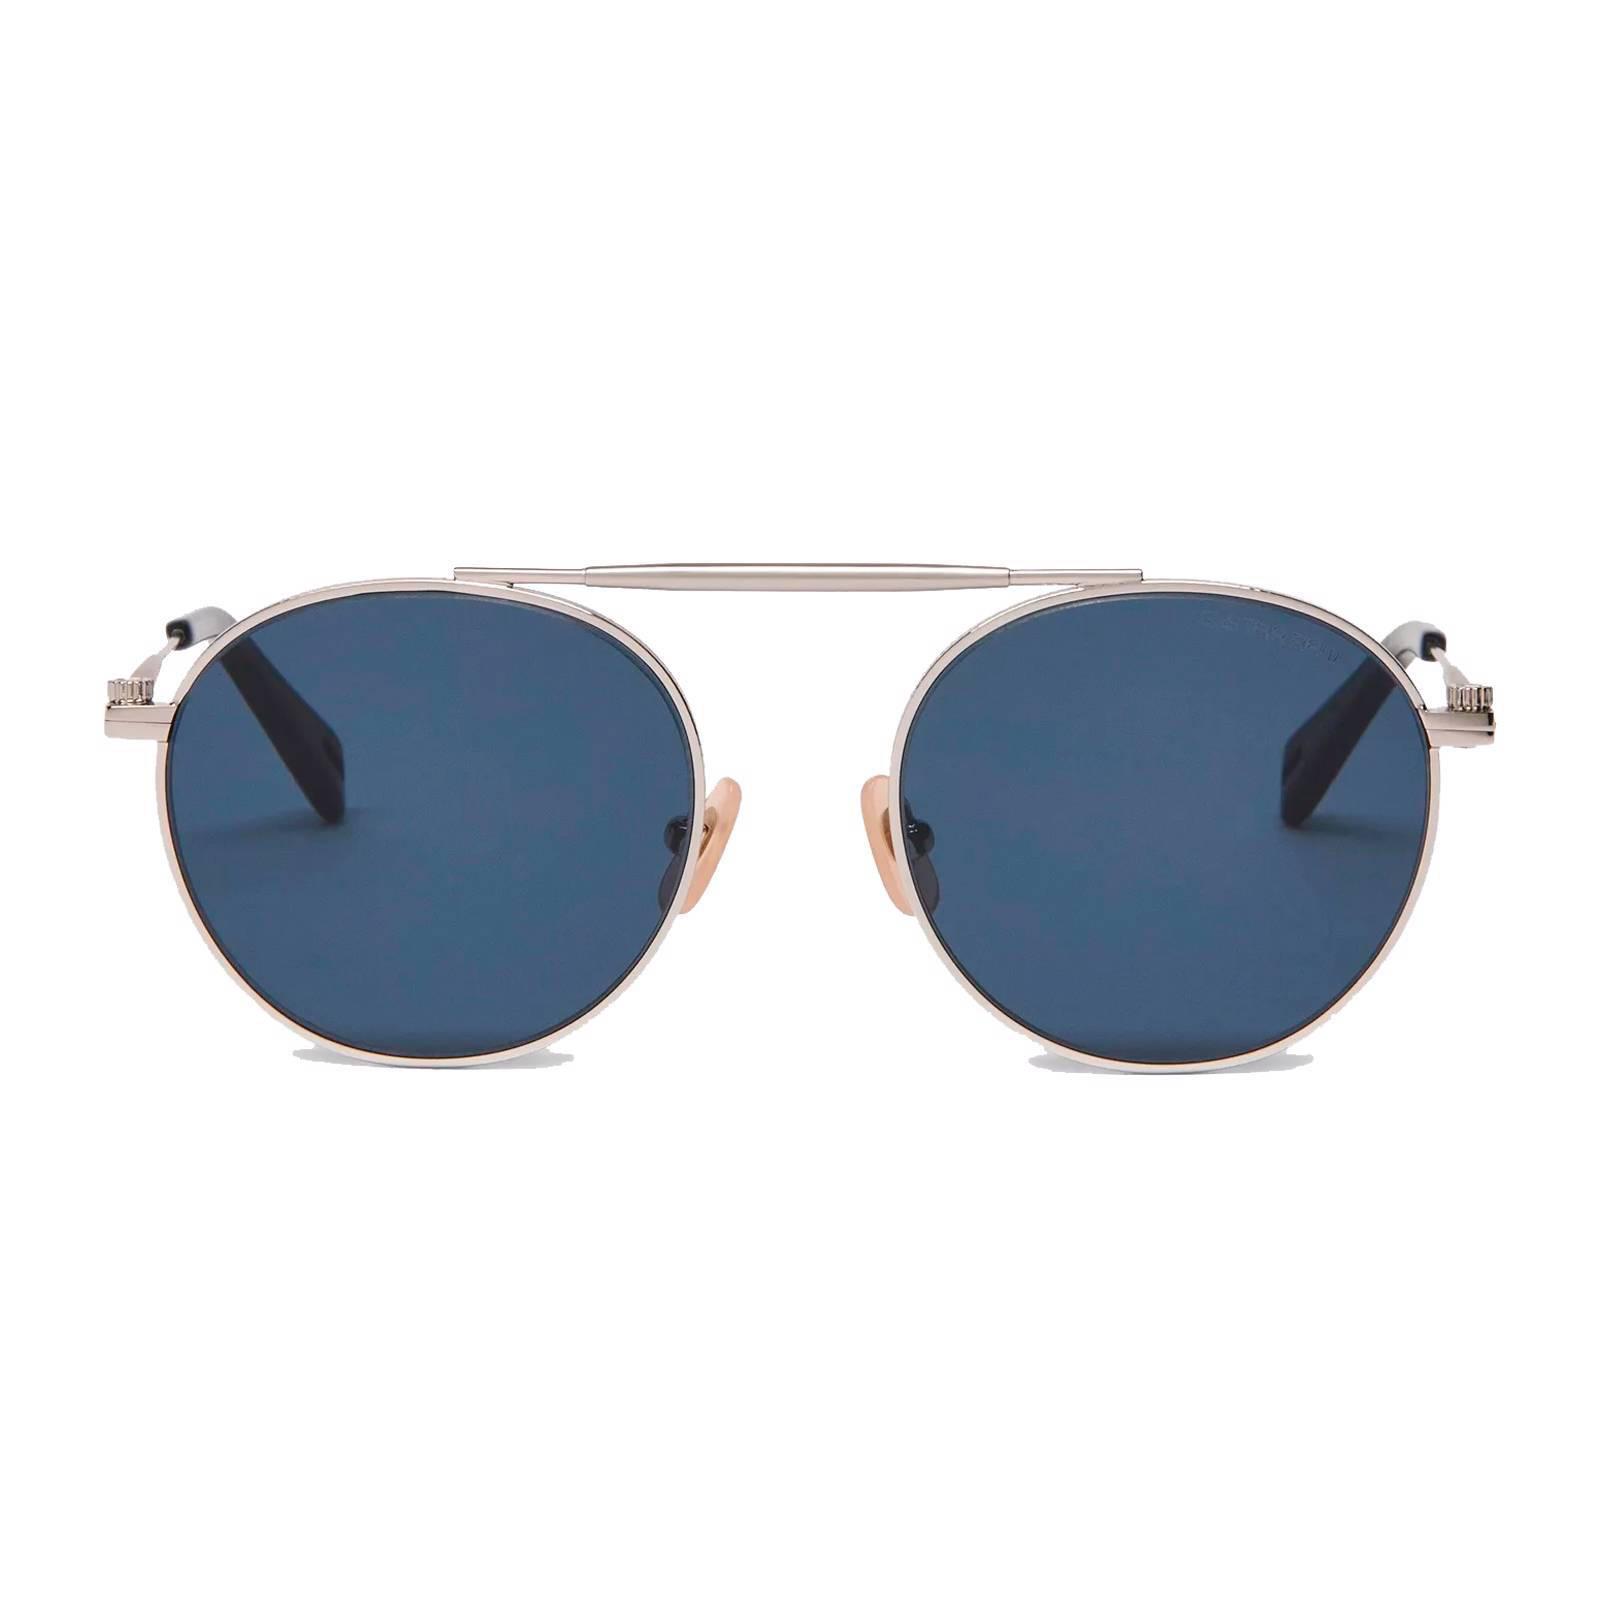 Star Eyewear Zonnebril G Metal Brycan Gs120s Wehkamp Raw a6qxZxT